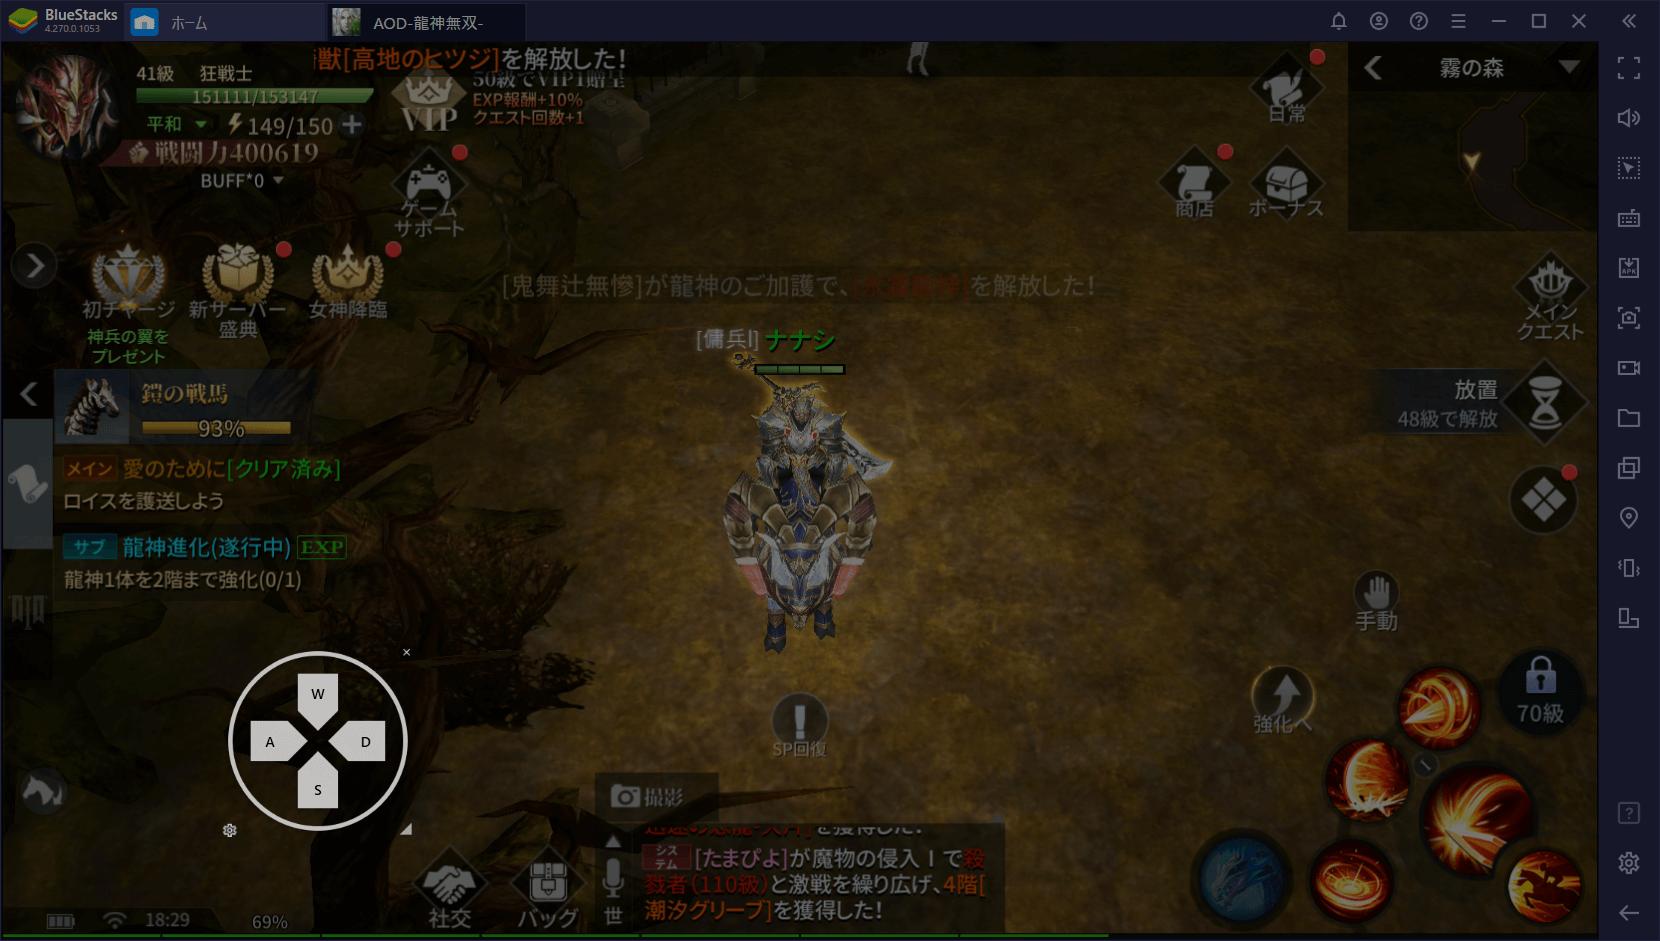 BlueStacksを使ってPCで『AOD-龍神無双-』を遊ぼう